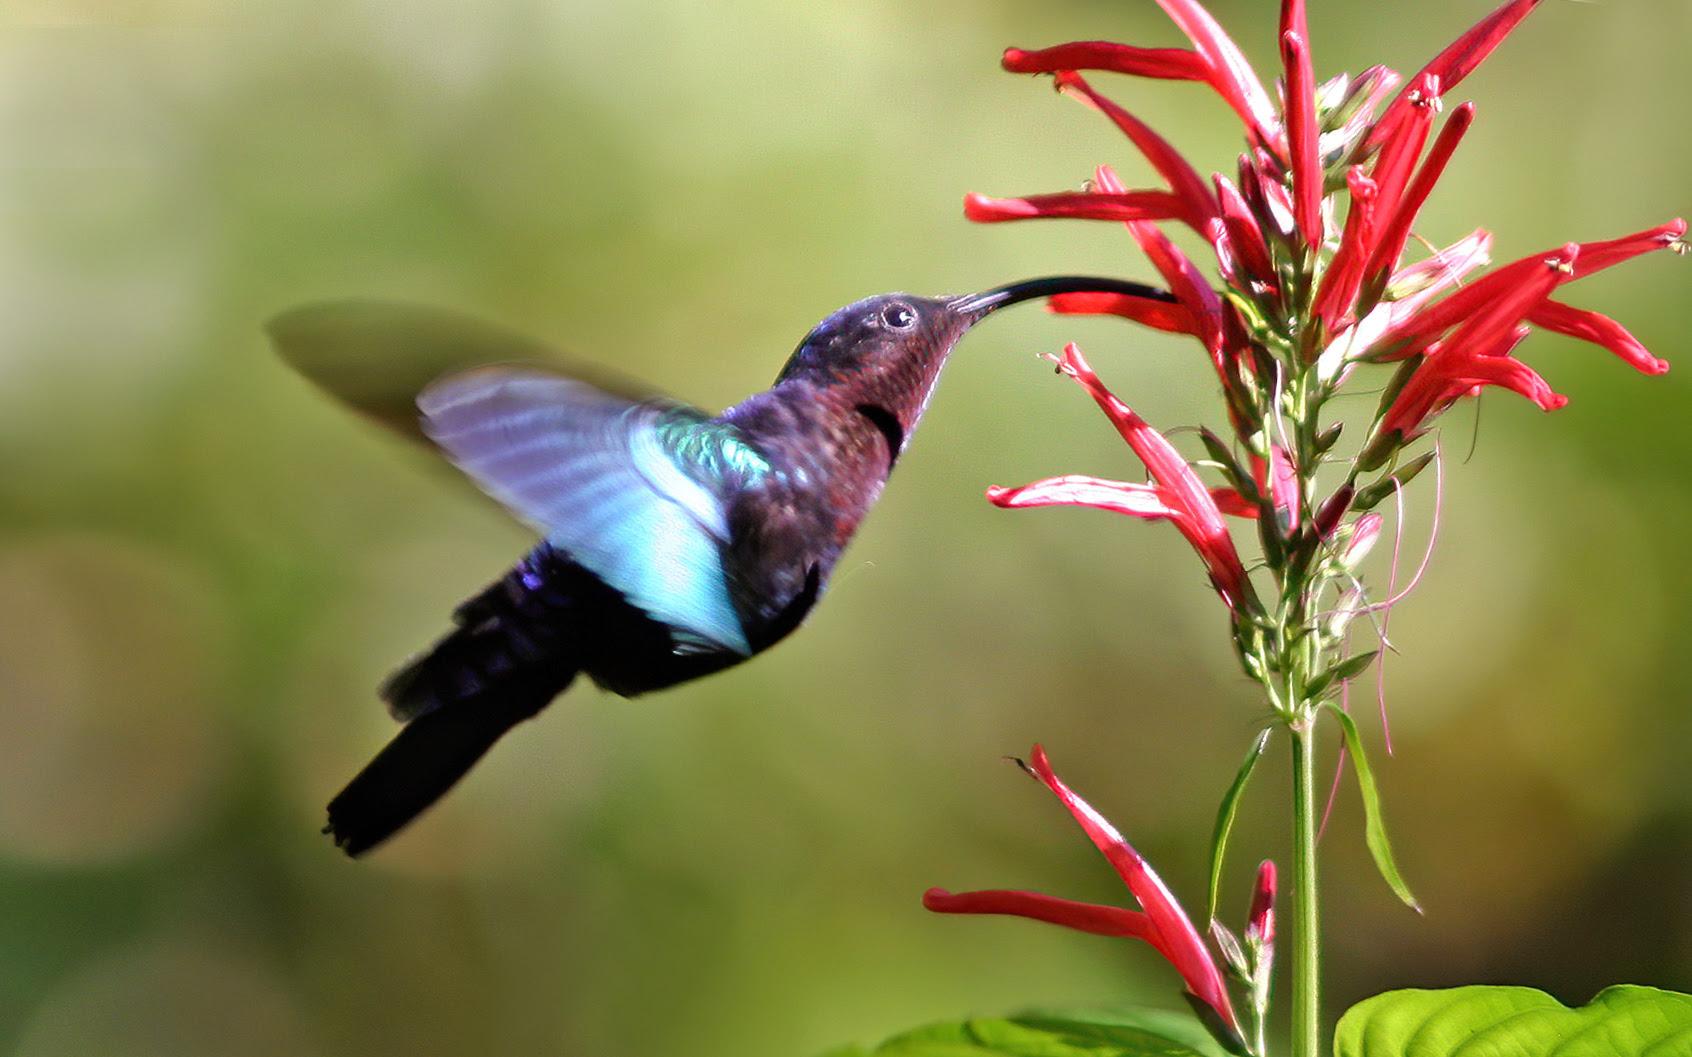 http://upload.wikimedia.org/wikipedia/commons/4/46/Purple-throated_carib_hummingbird_feeding.jpg